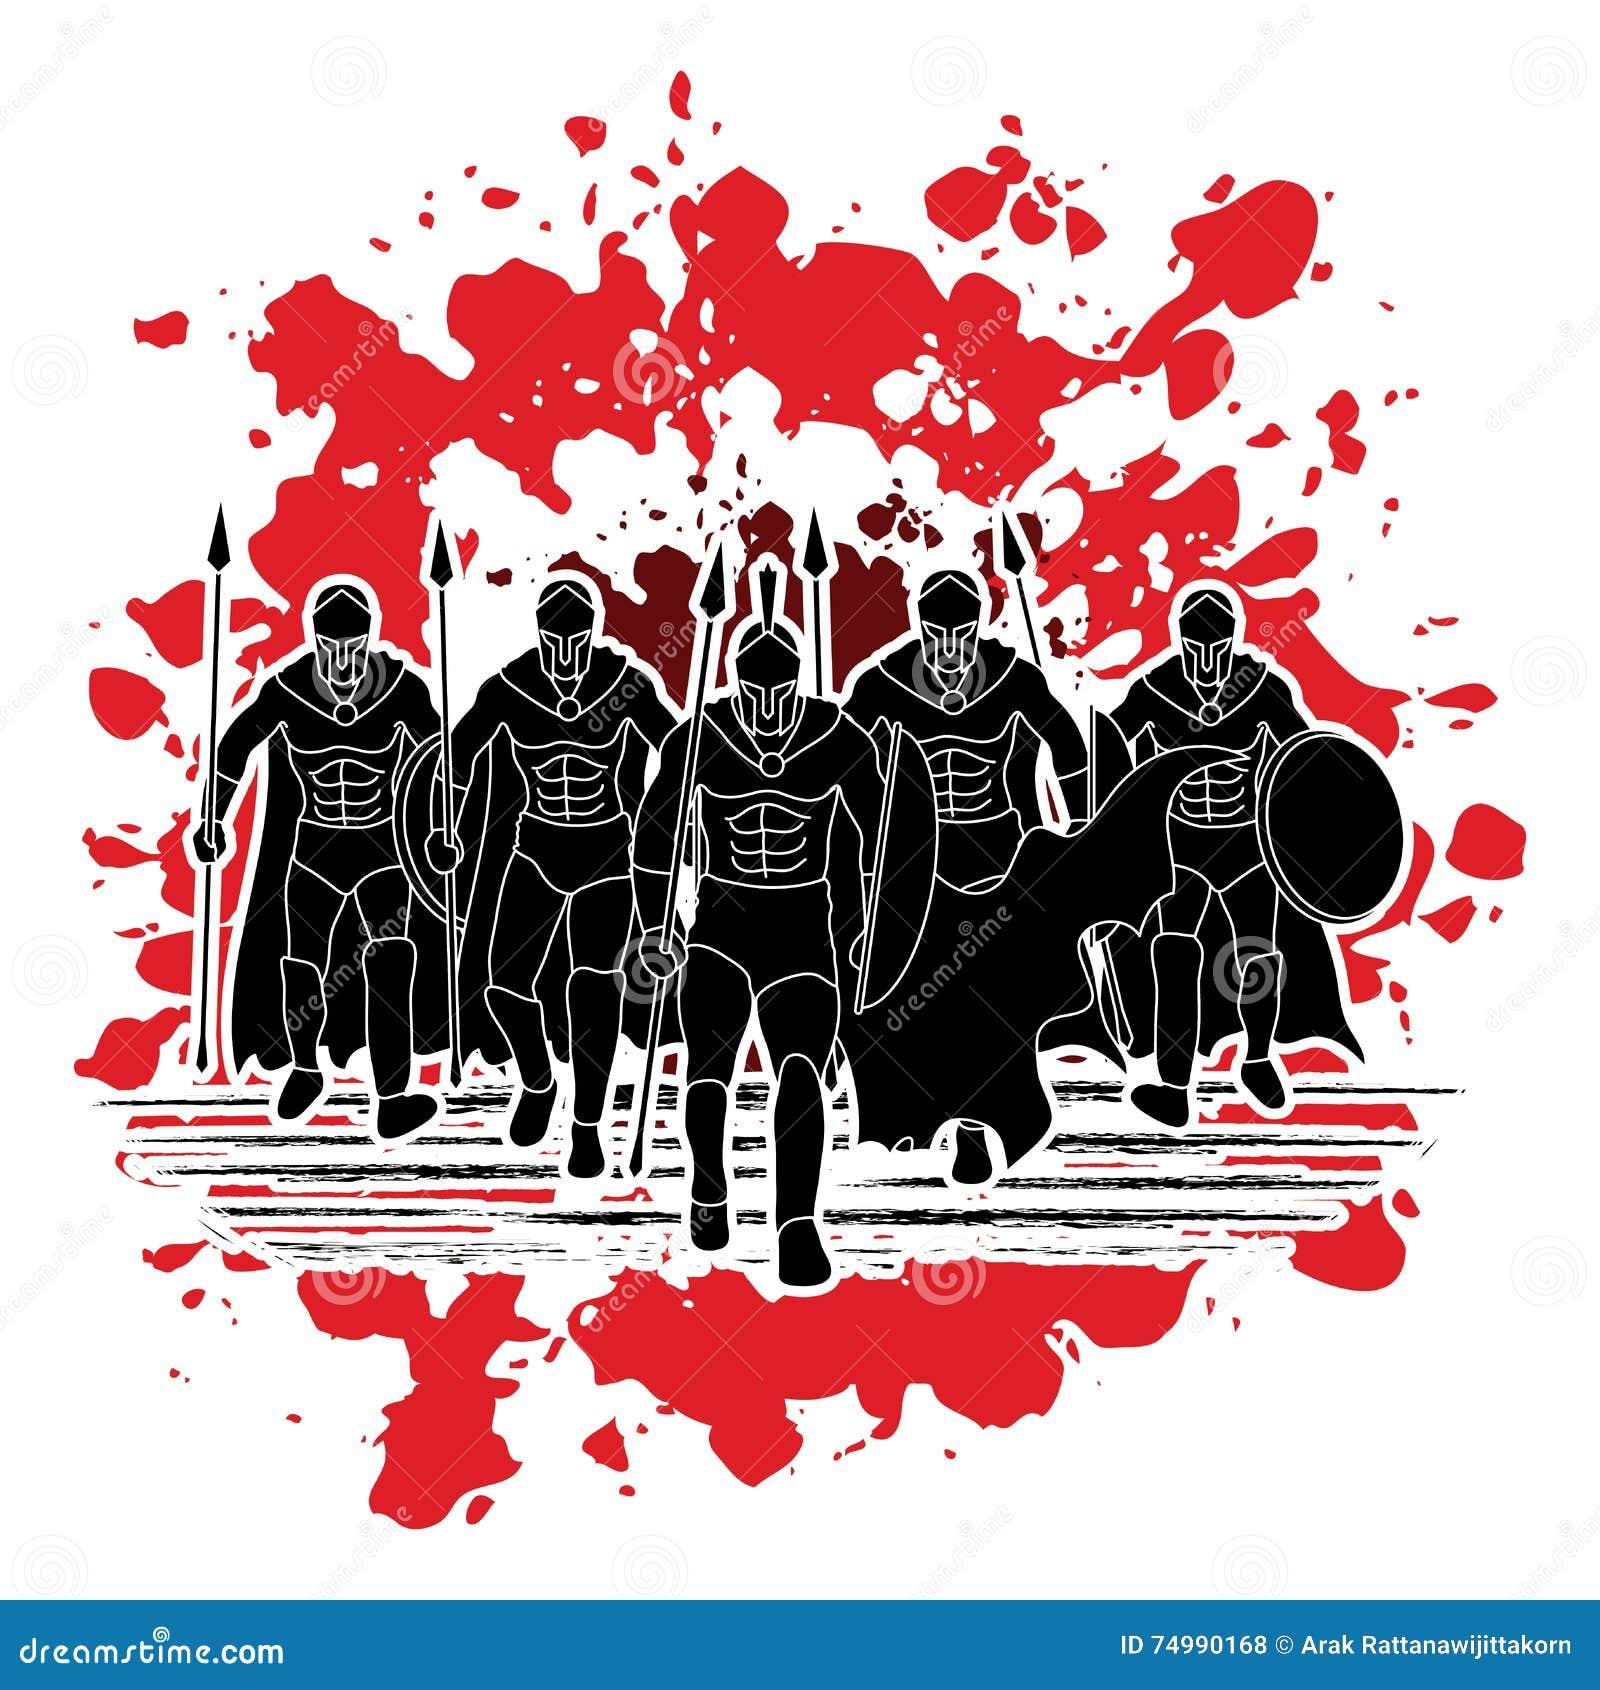 Warriors New Stadium Seat License: Spartan Warrior Stock Vector. Illustration Of Mythology